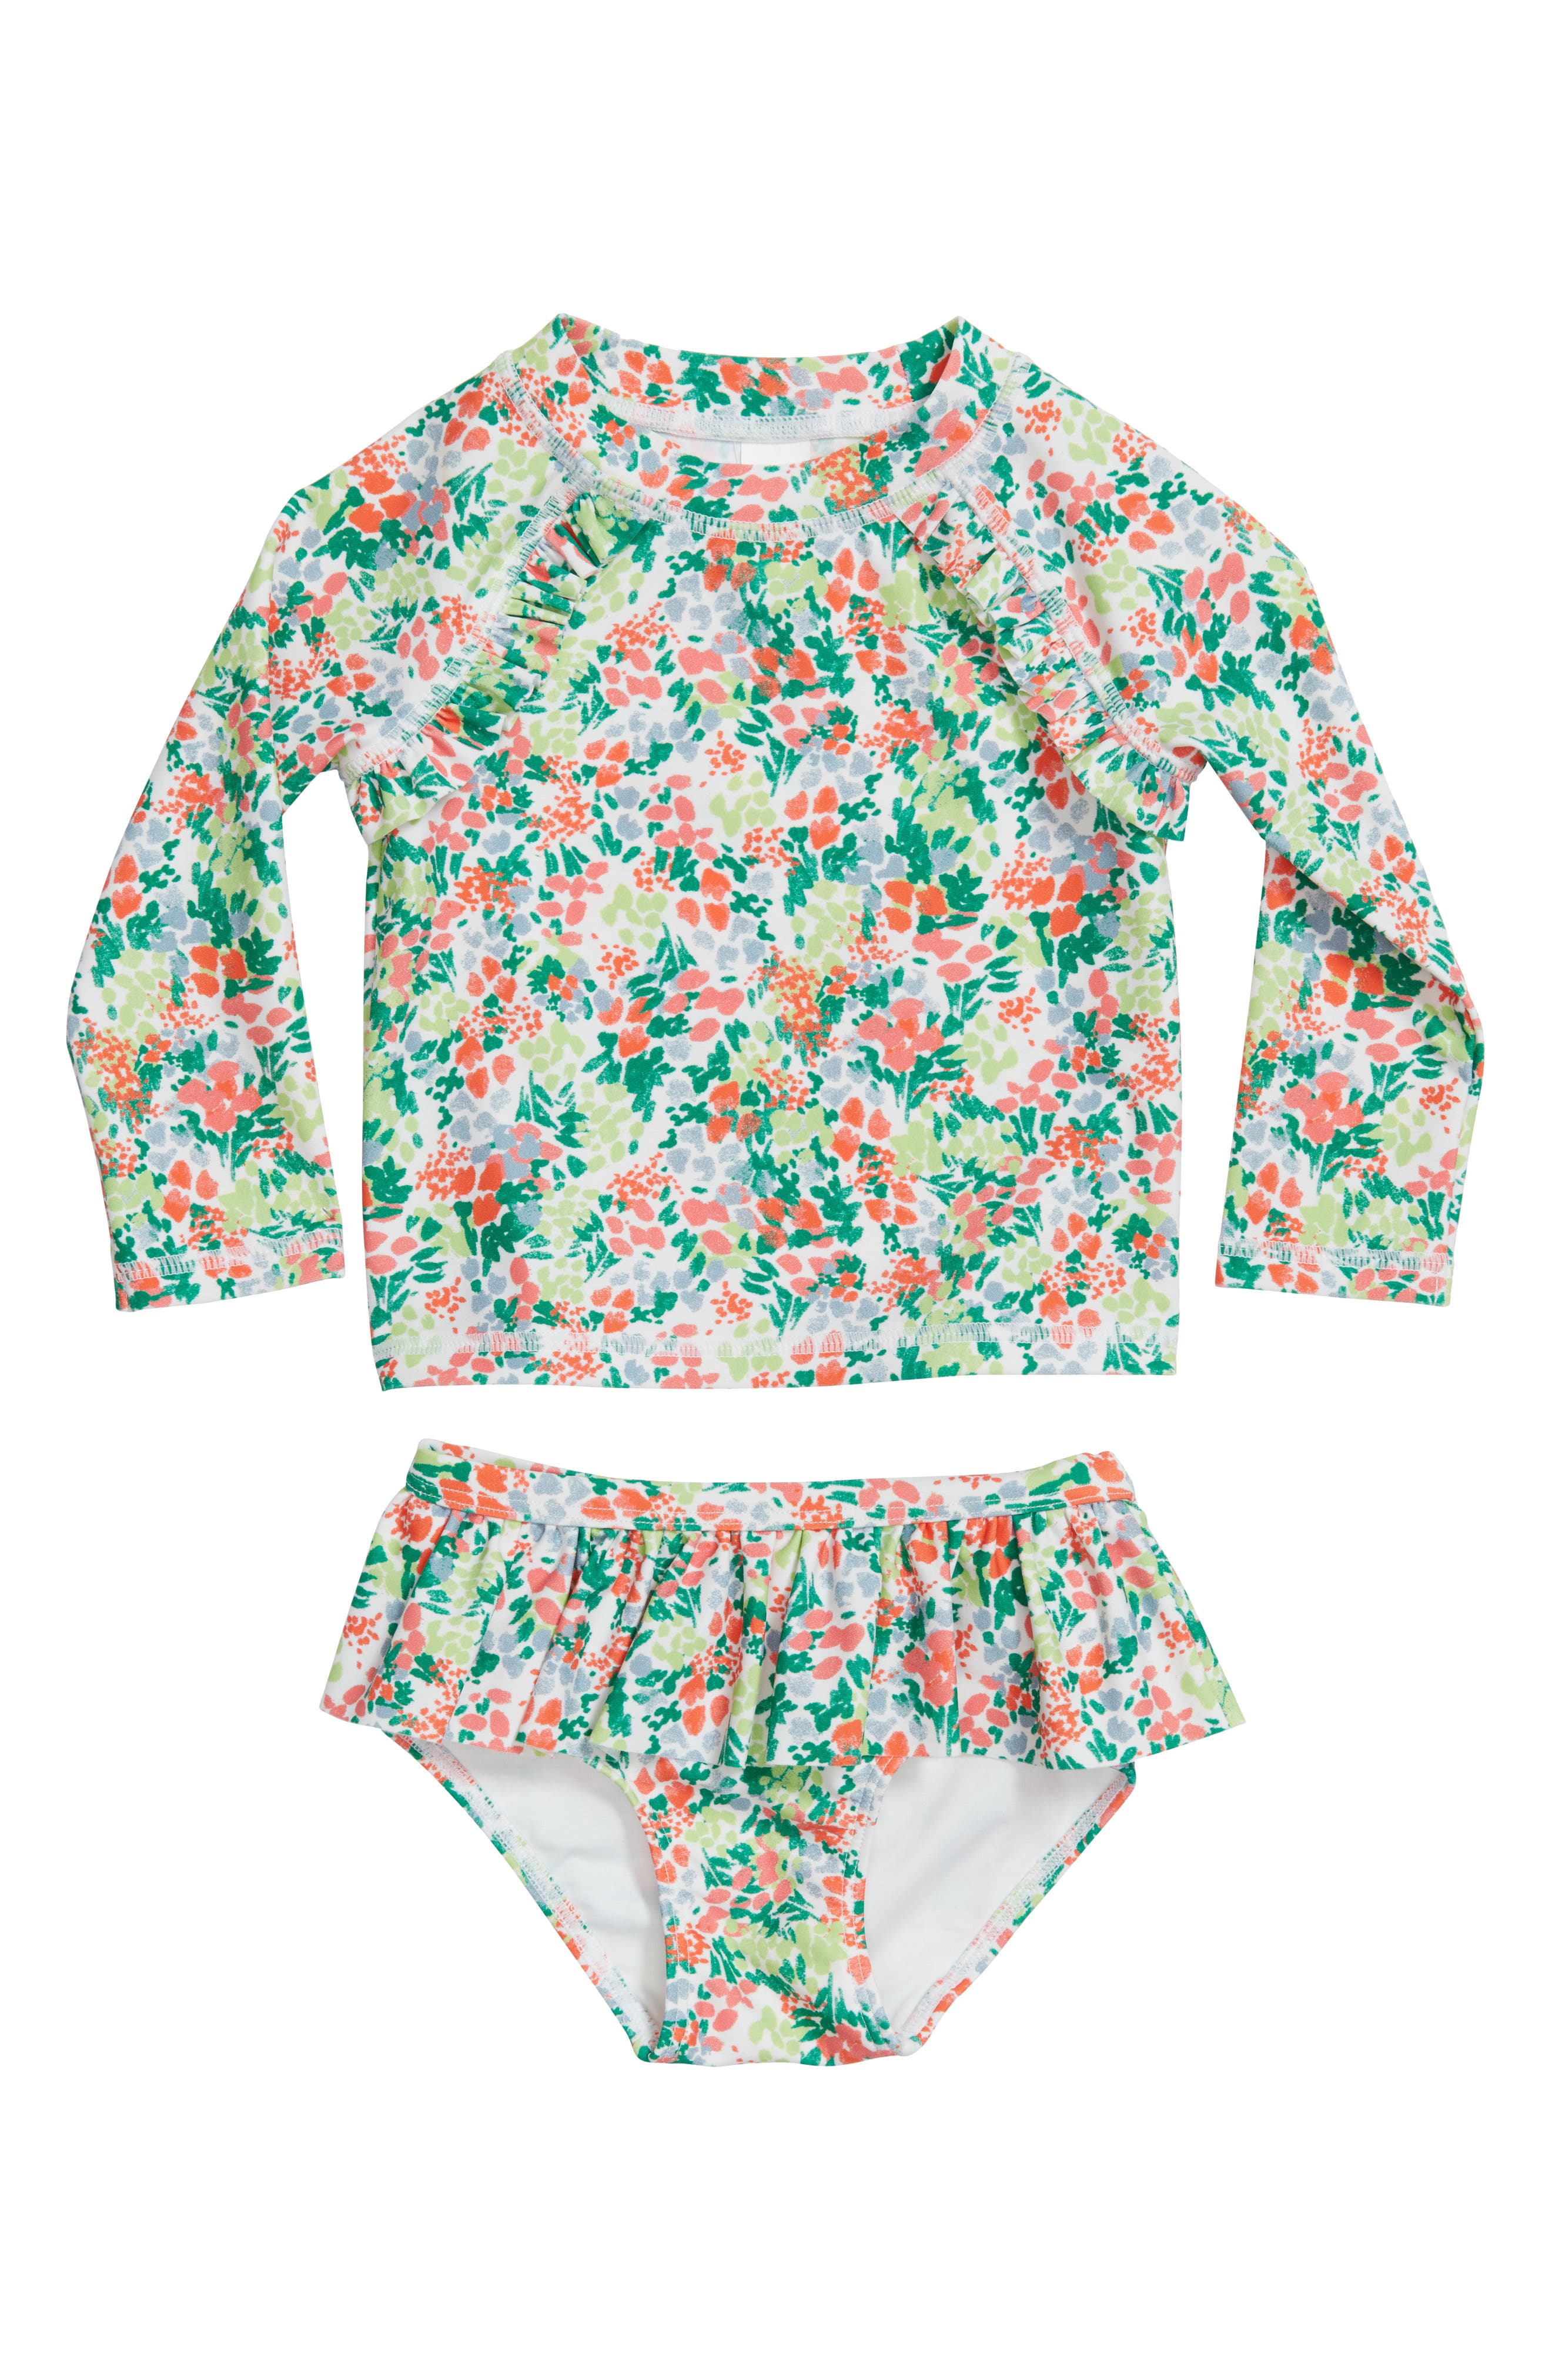 Two-Piece Rashguard Swimsuit,                         Main,                         color, White Multi Meadow